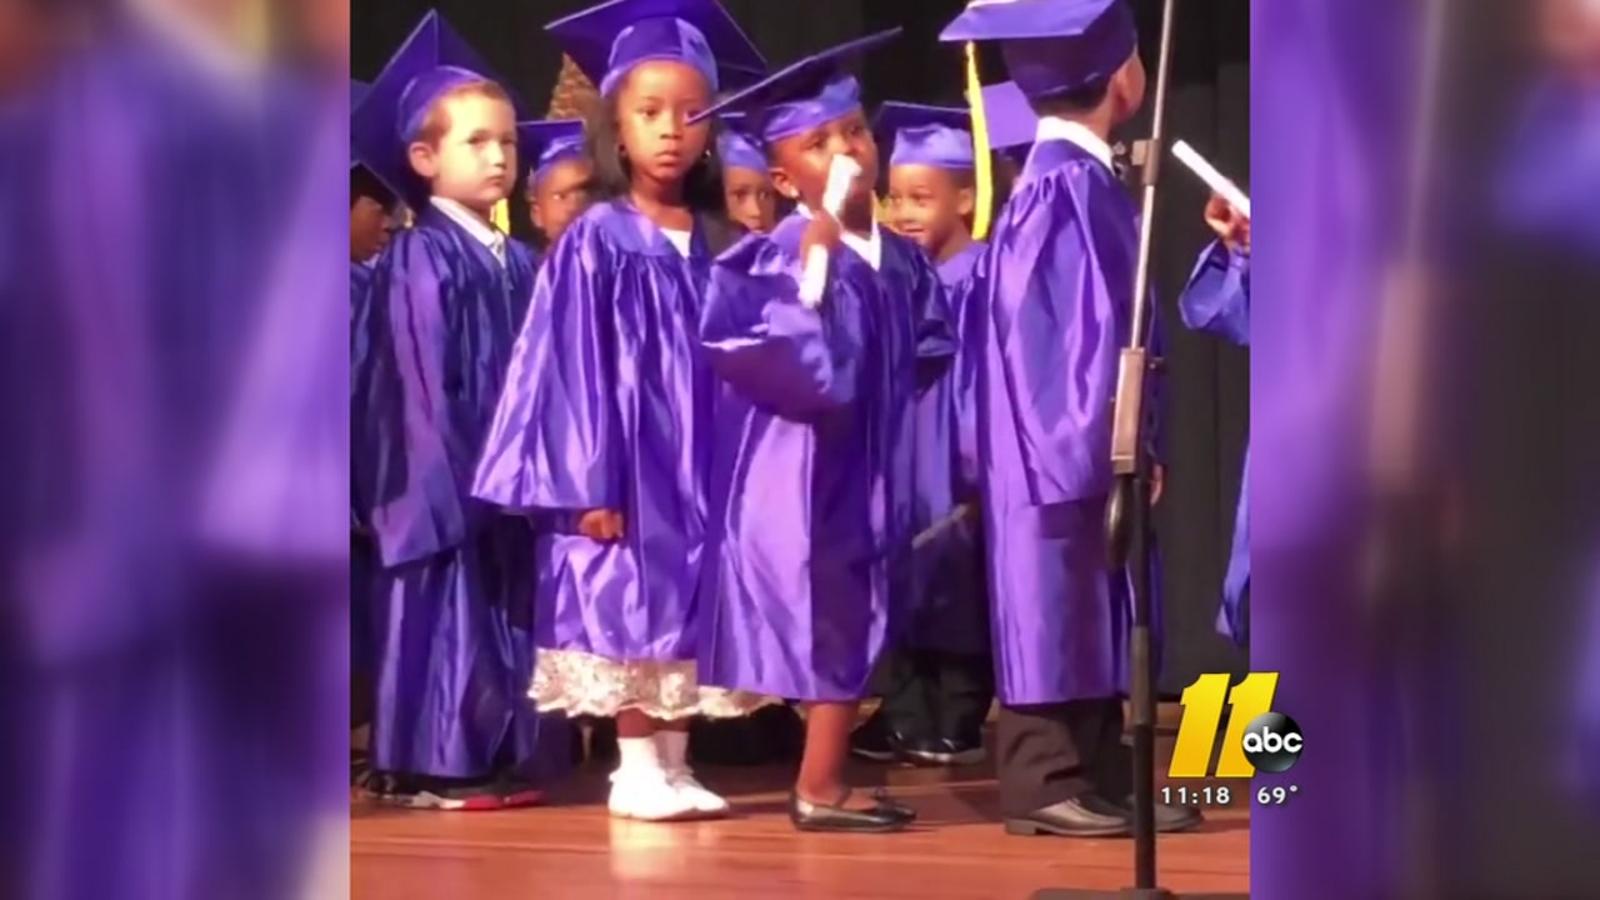 5c38cf29c92 Dancing Durham 5-year-old steals show at Pre-K graduation